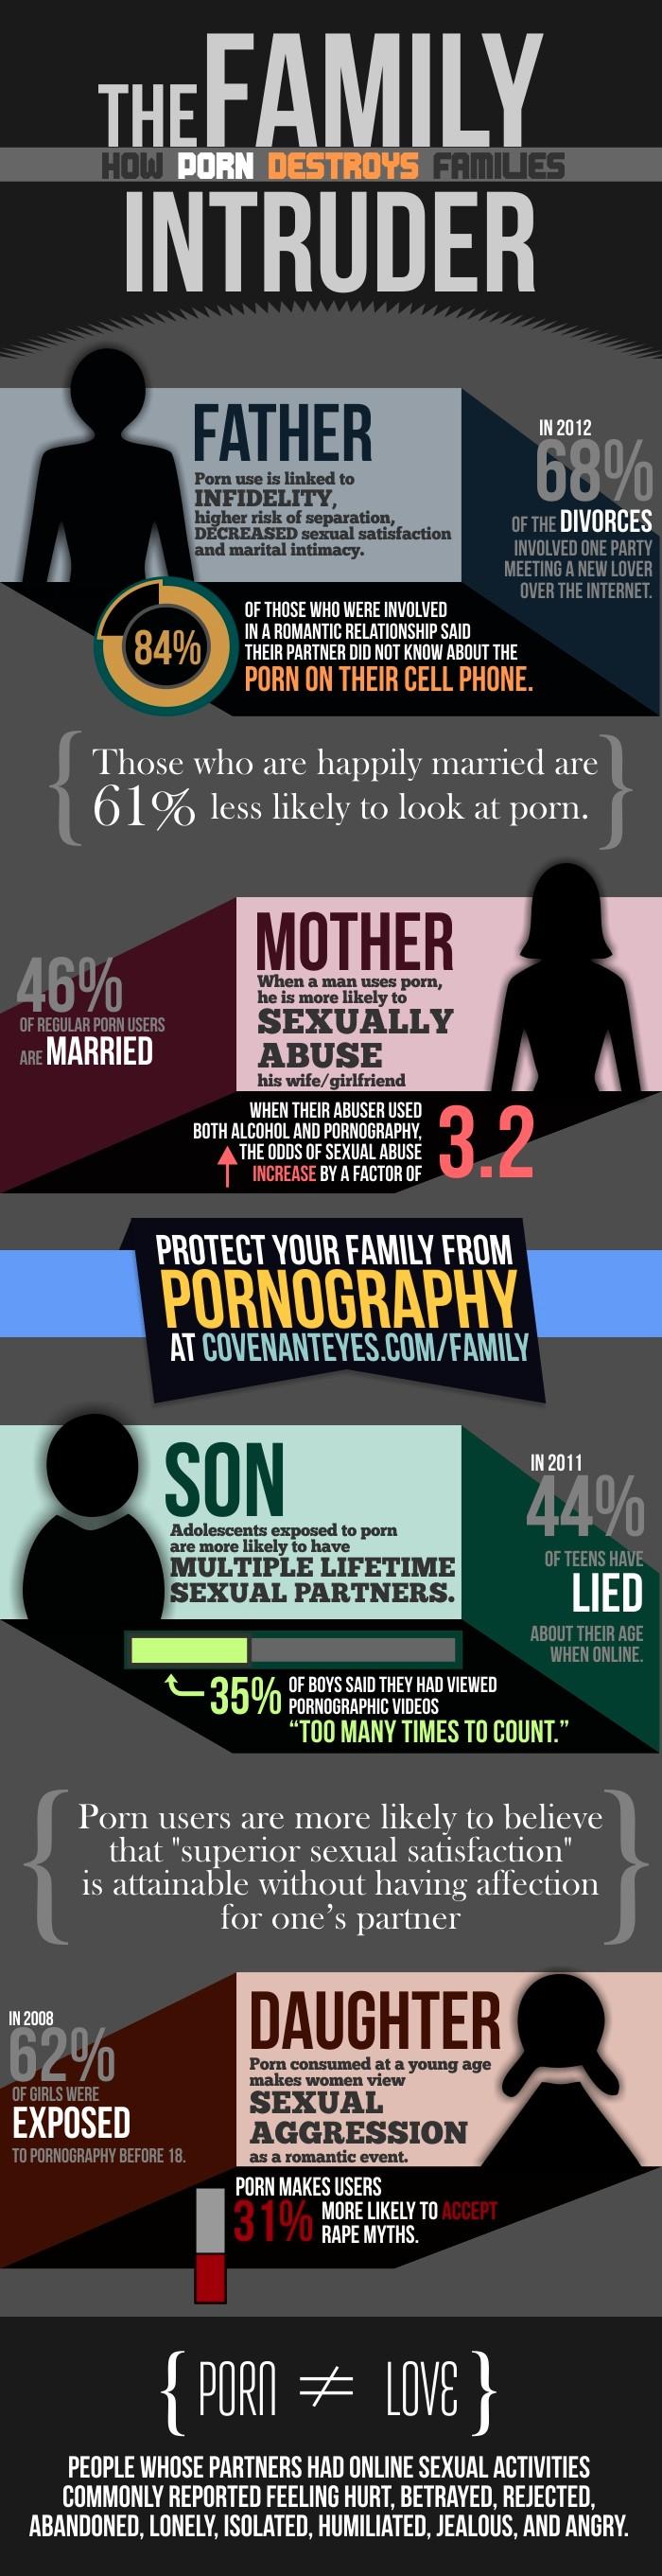 The Family Intruder: How Porn Destroys Families